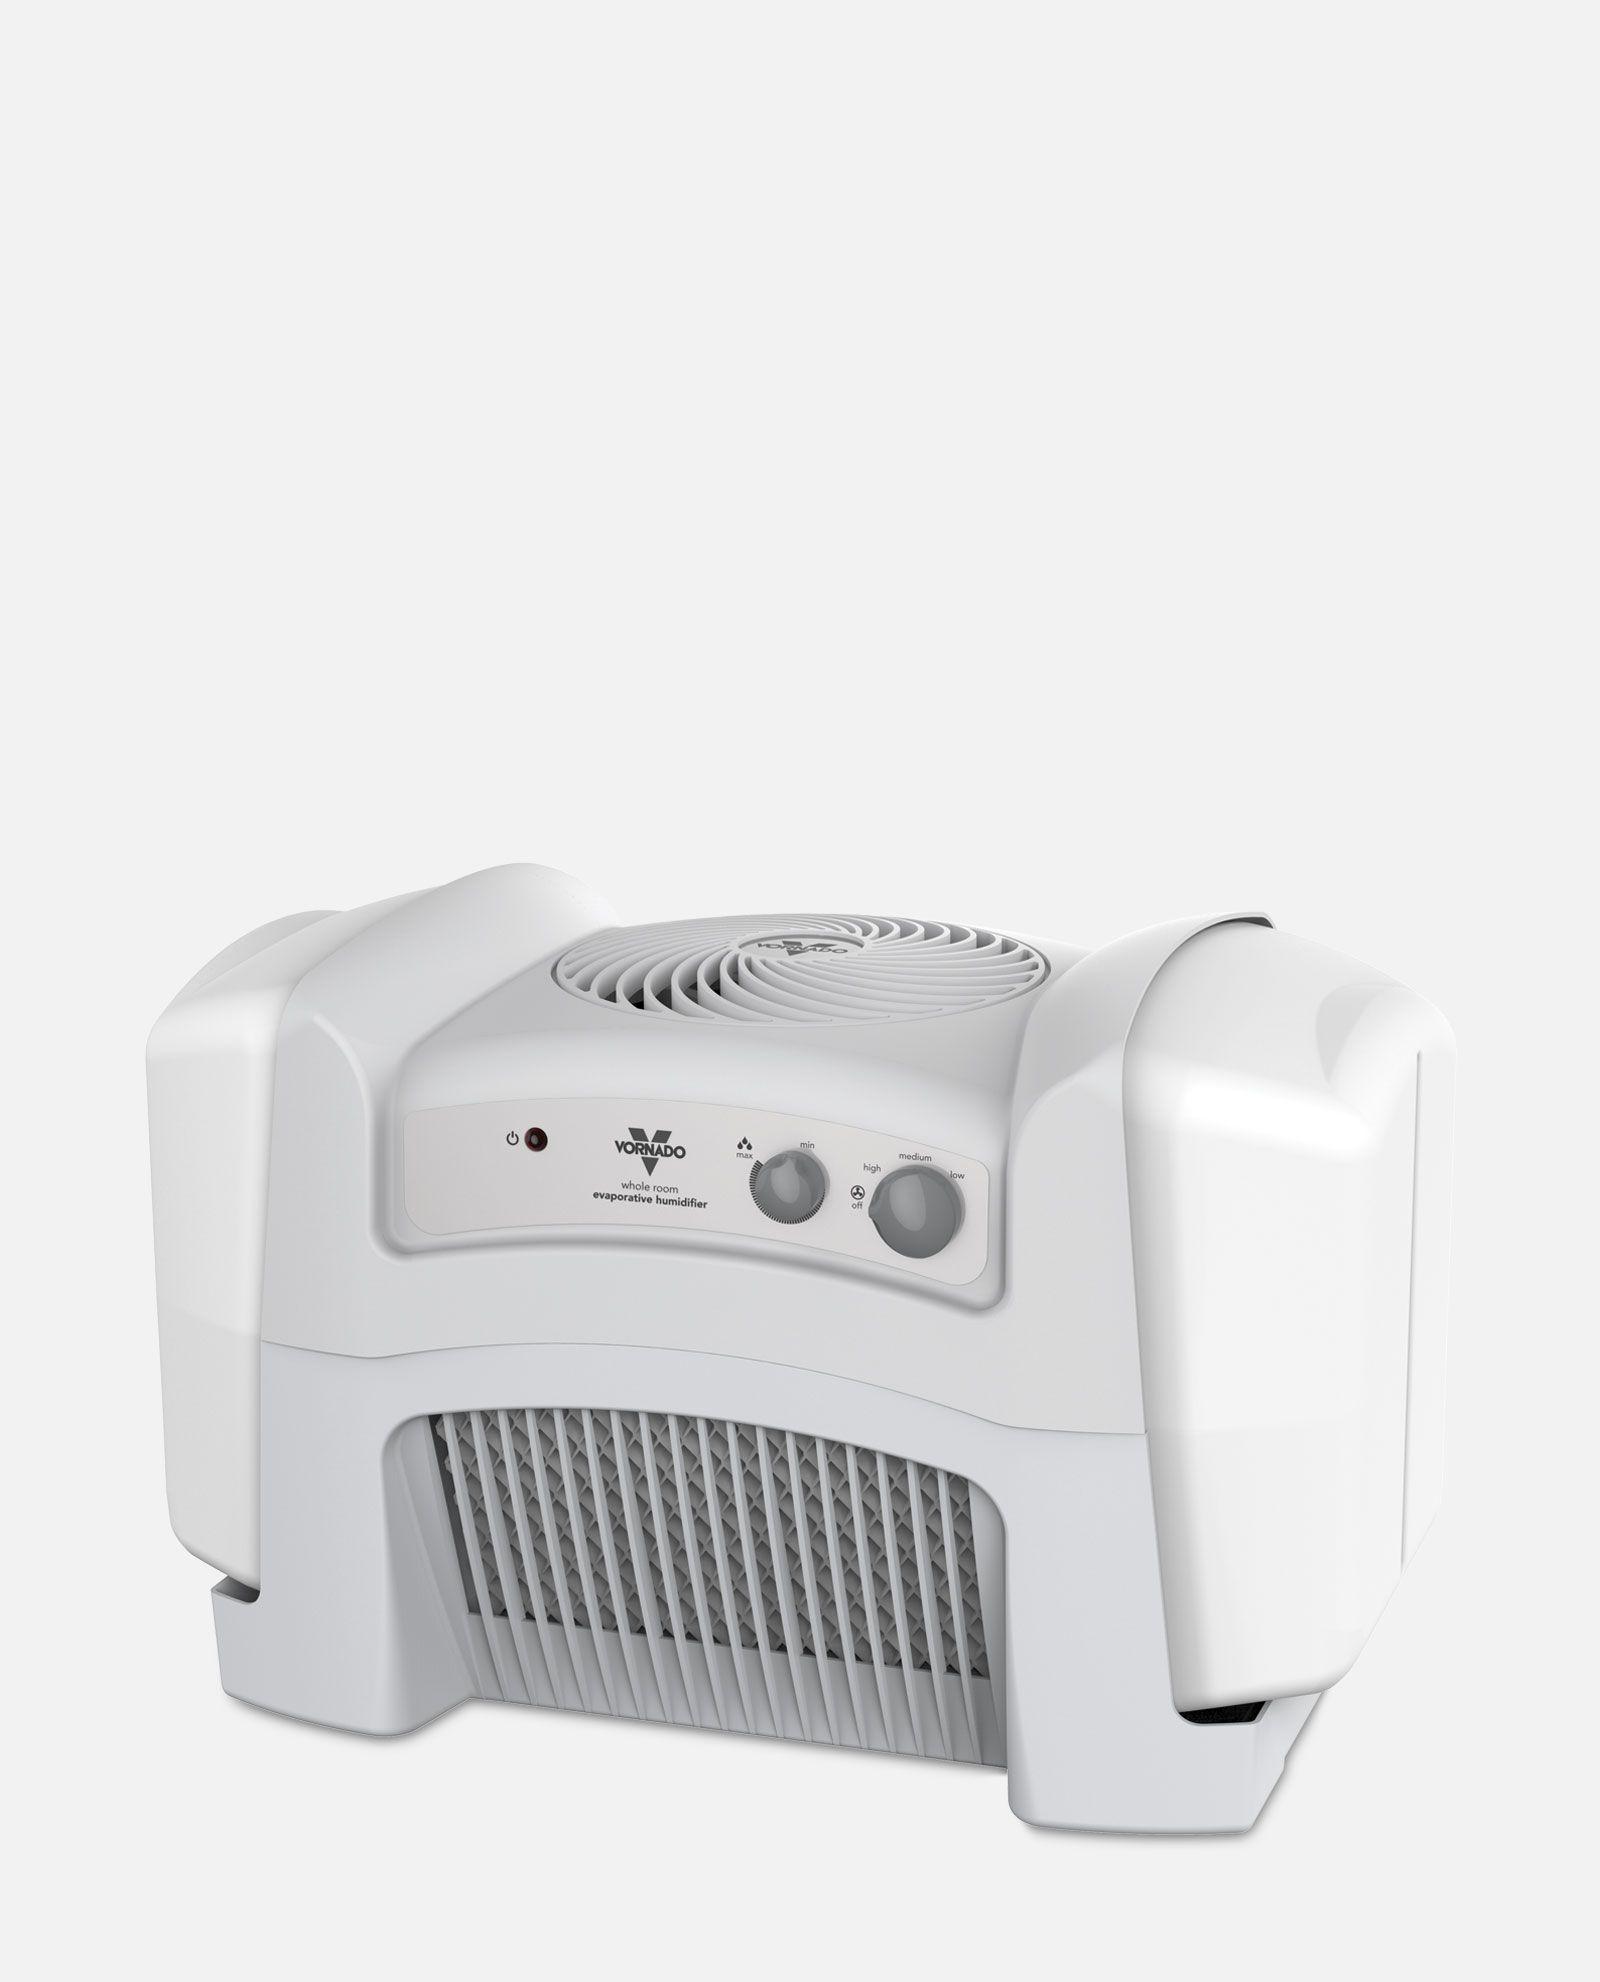 Evap40 evaporative humidifier vornado for Living room humidifier